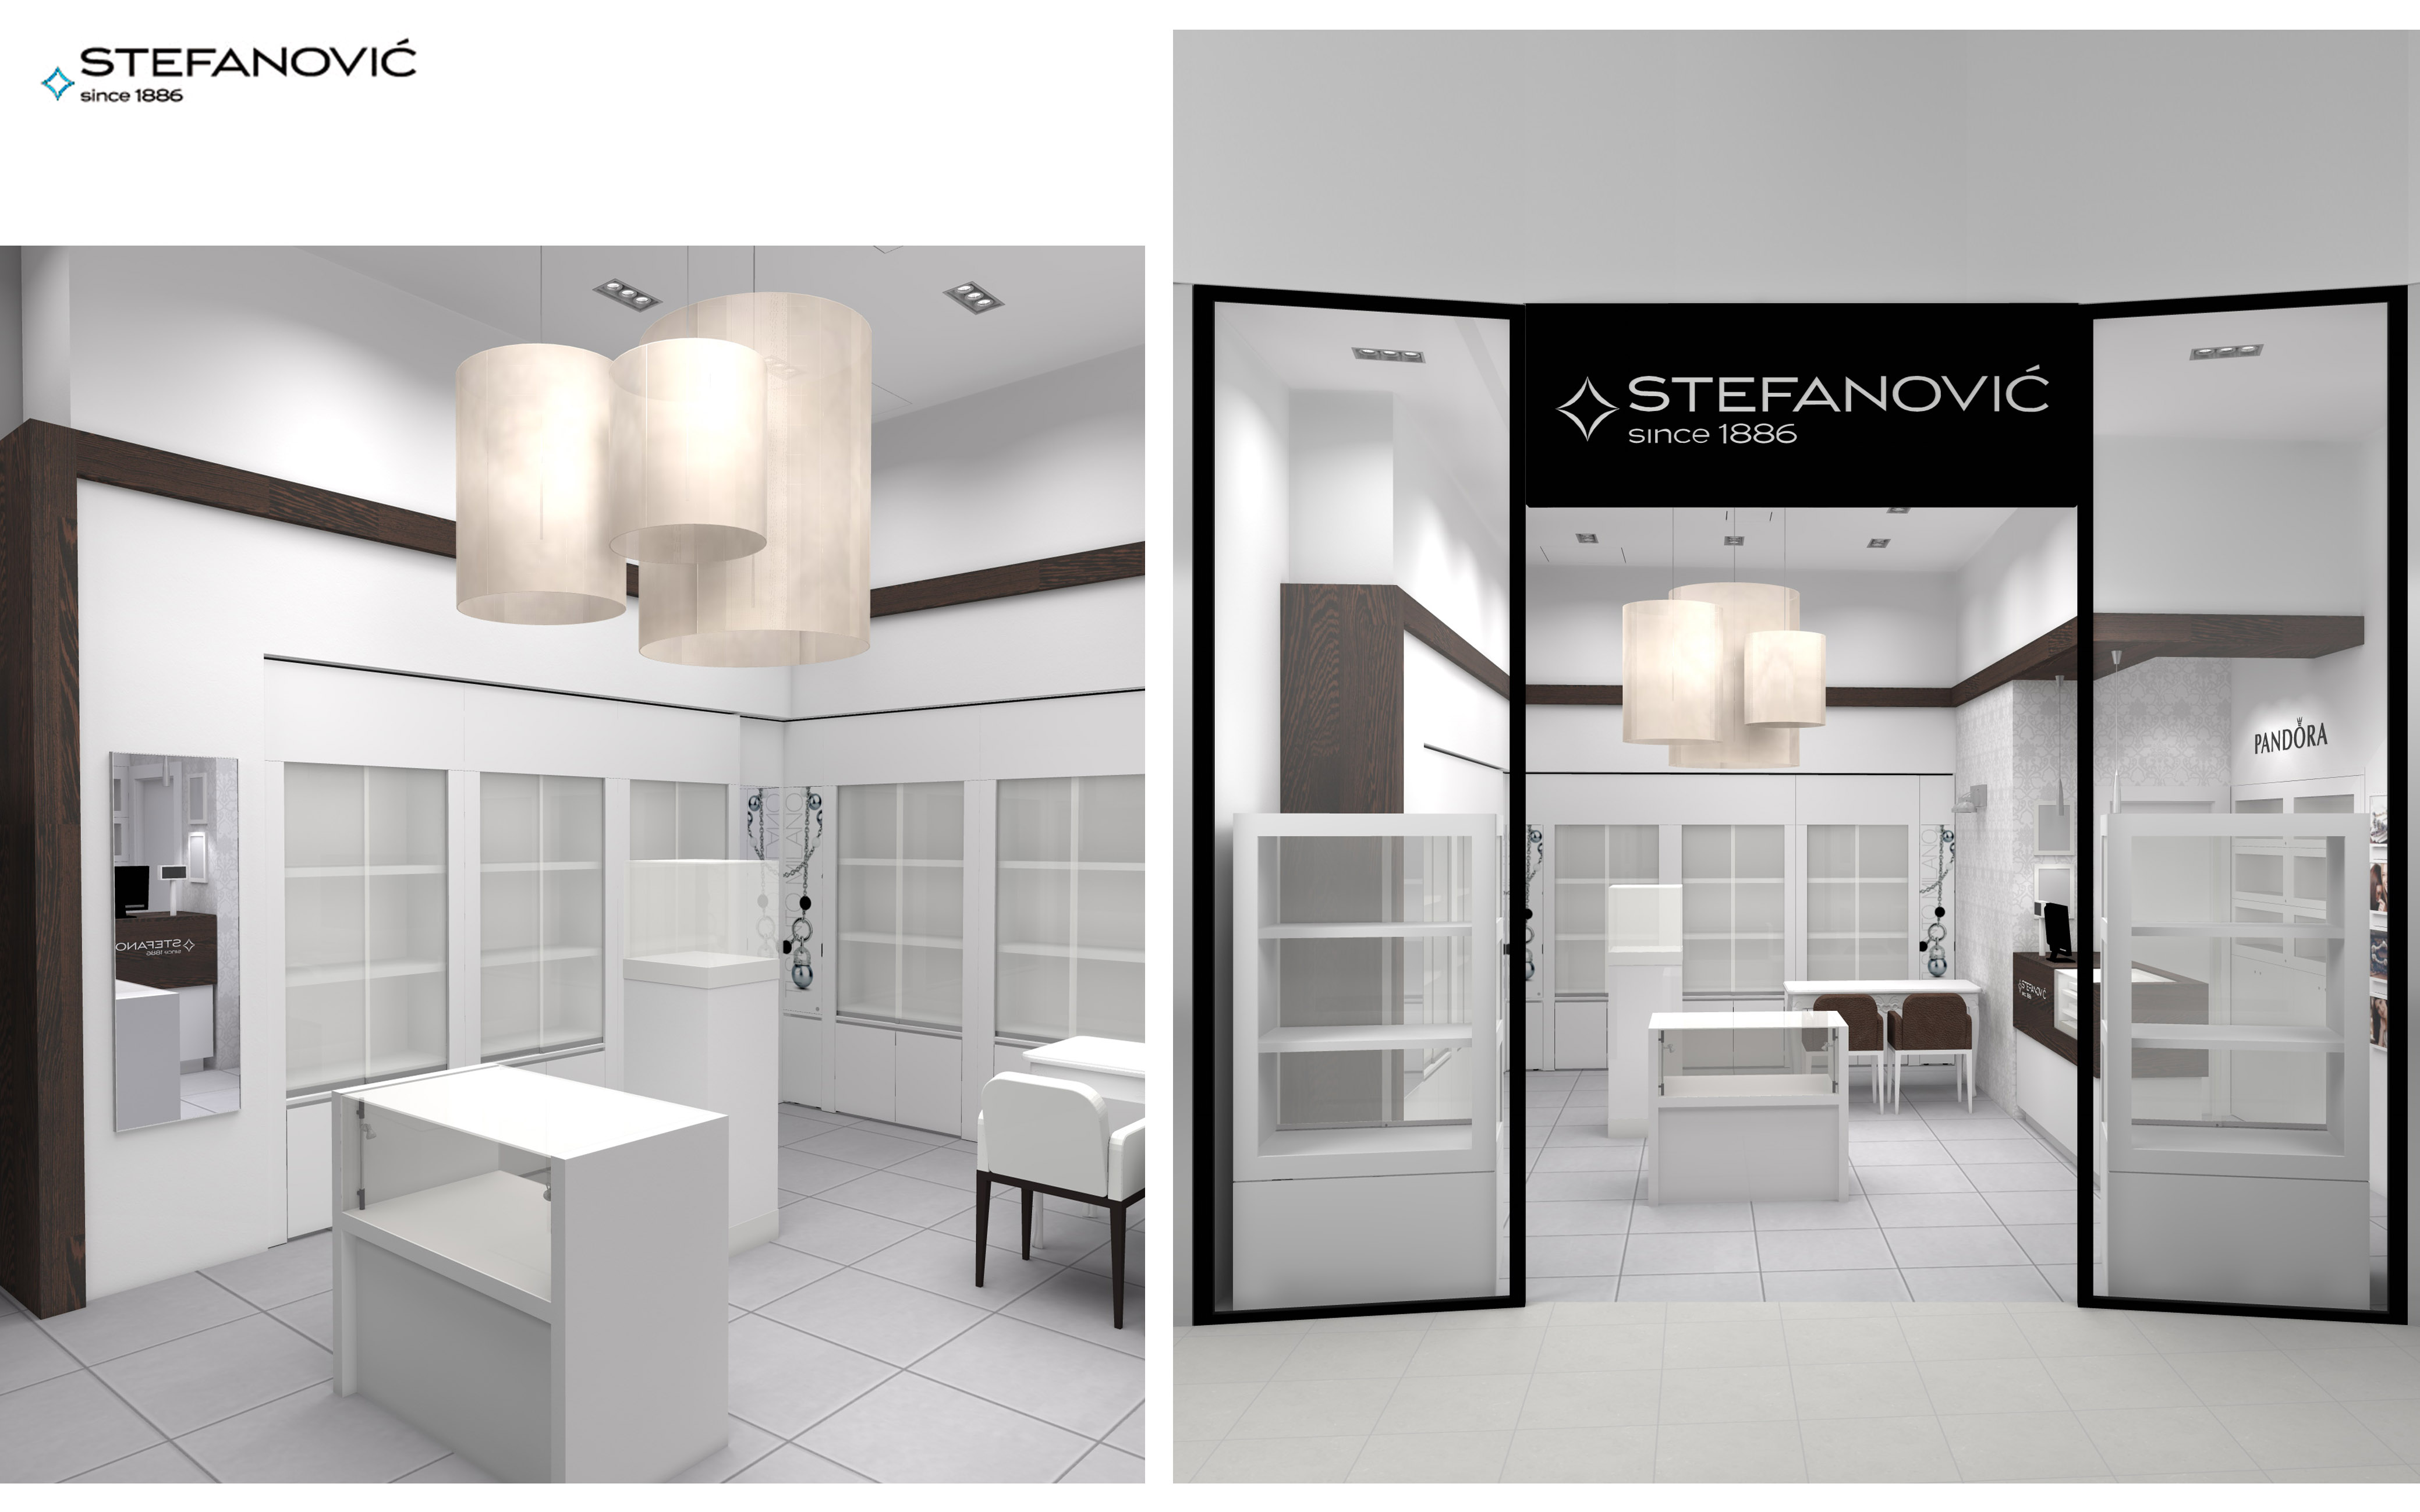 2012 STEFANOVIC TC Plaza_04